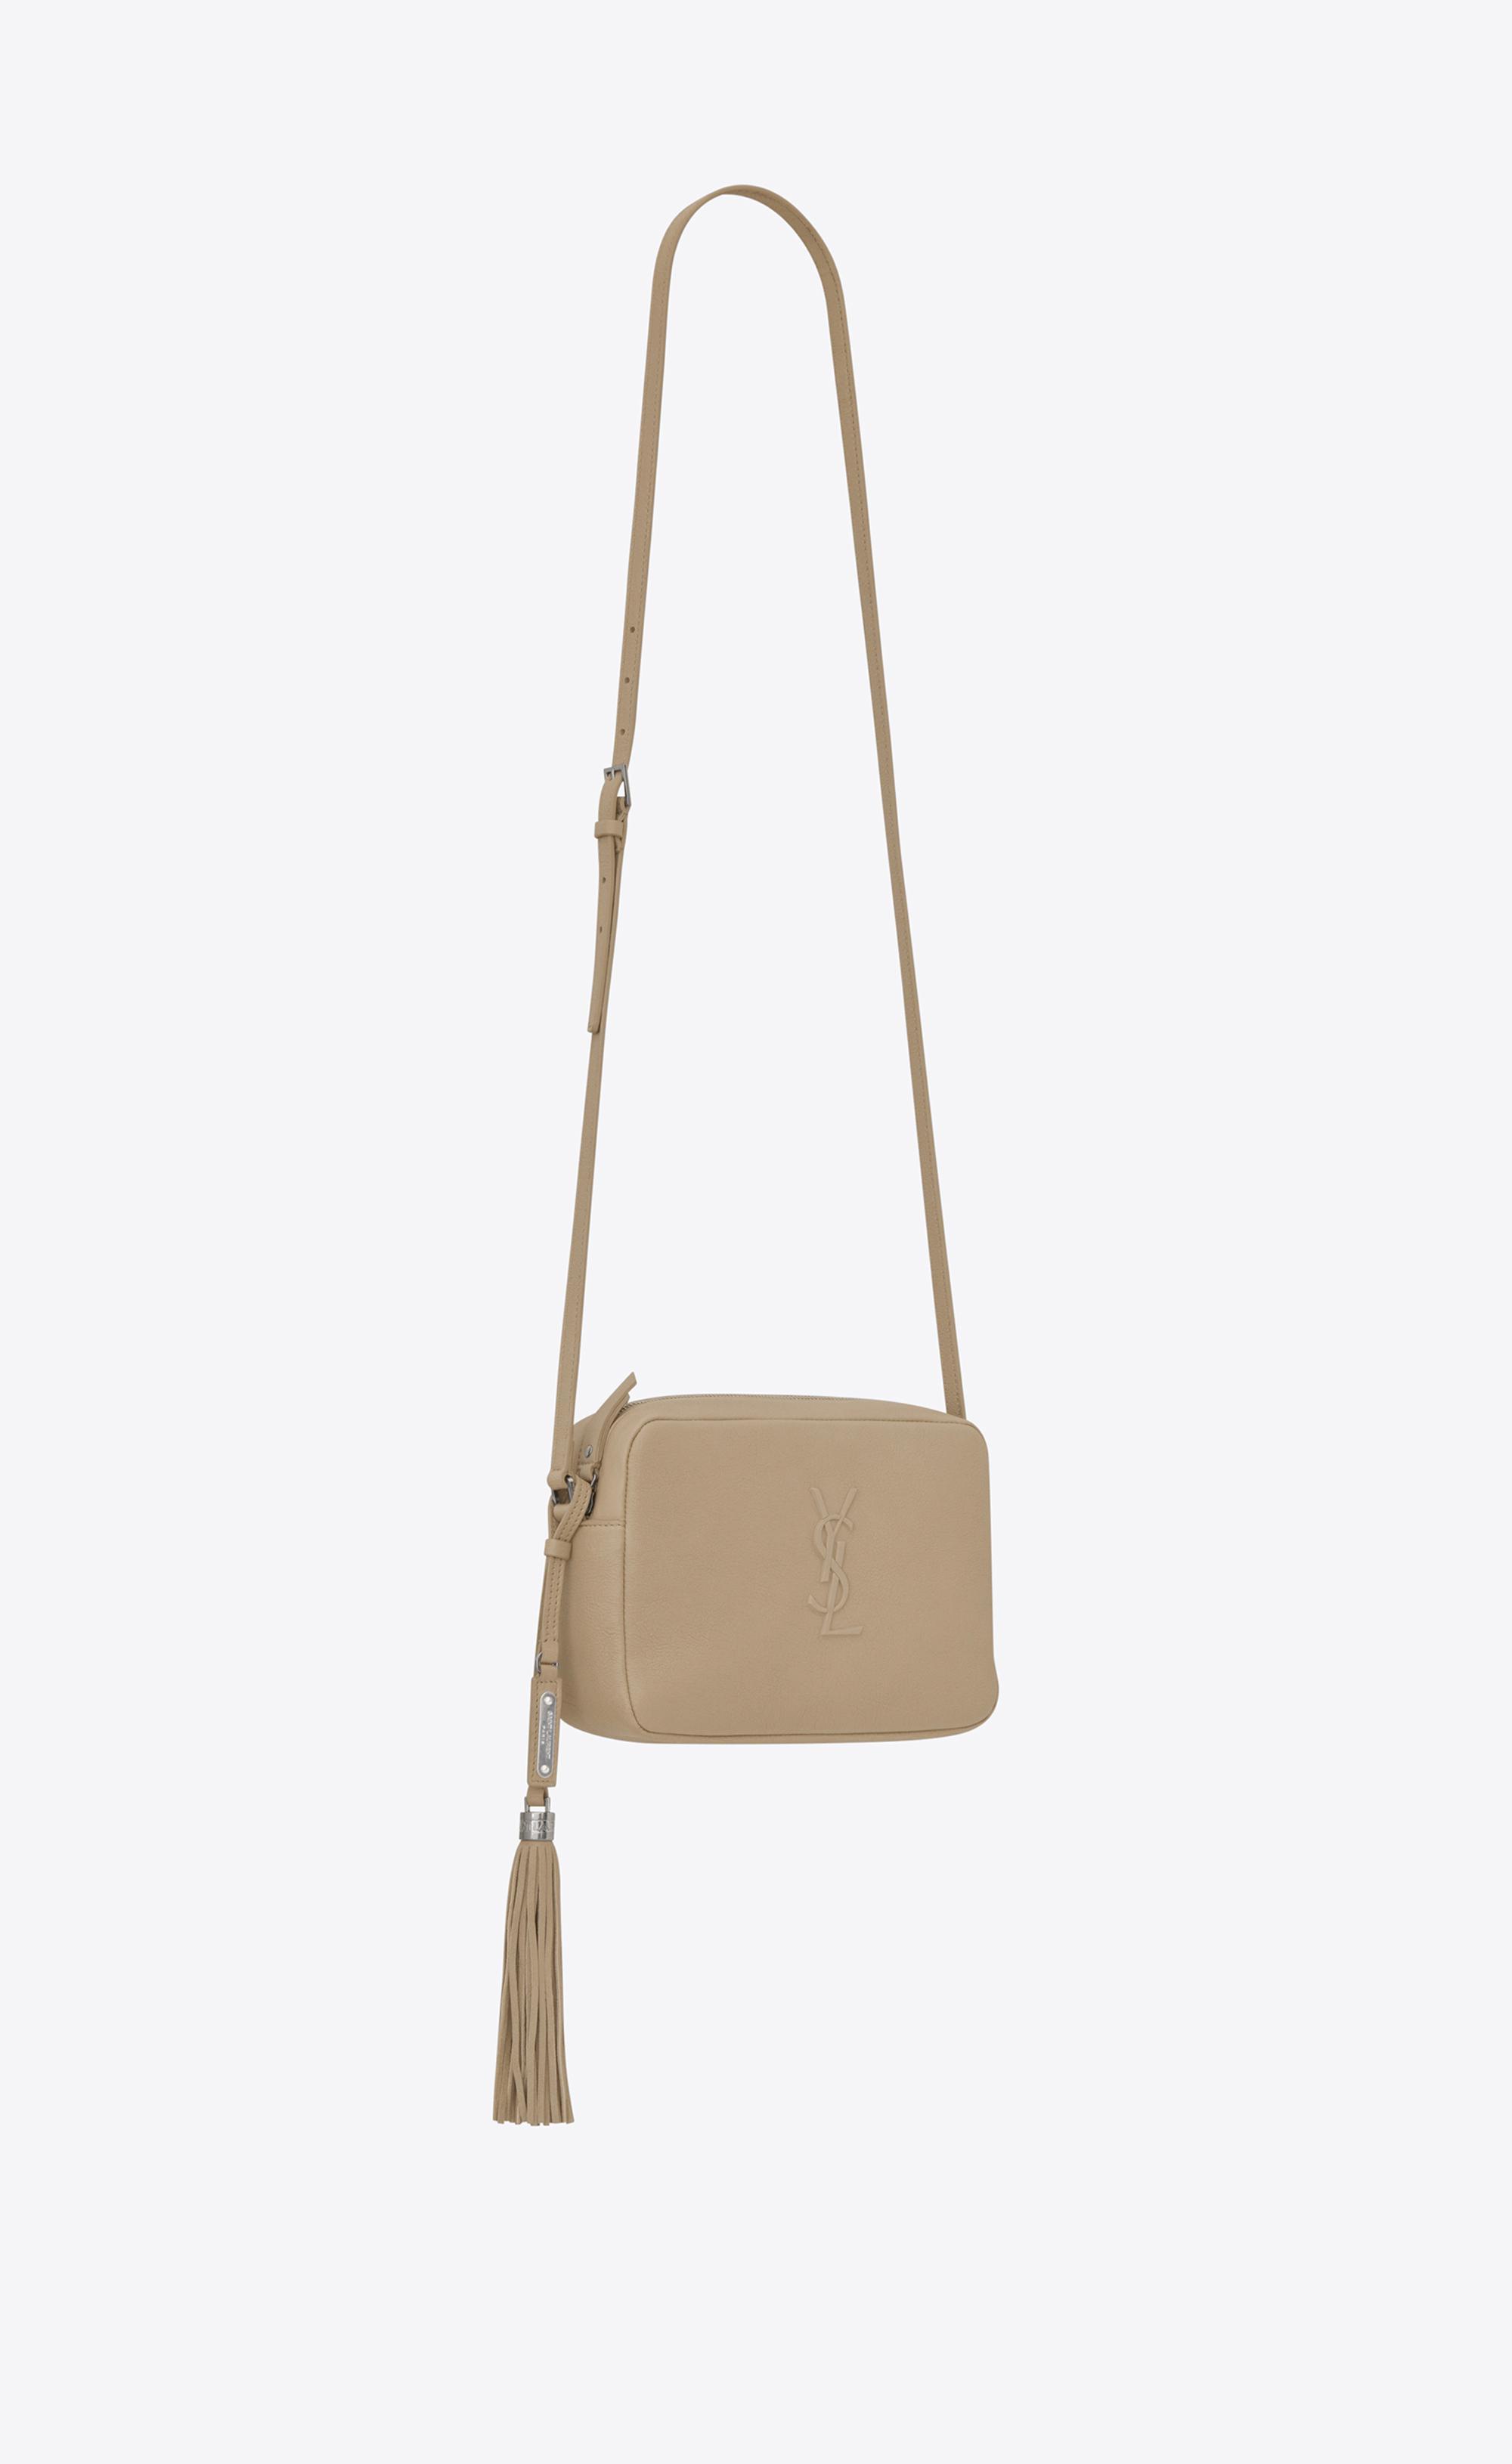 f2f76750b66 Saint Laurent Small Lou Camera Bag In Dark Beige Leather in Natural ...